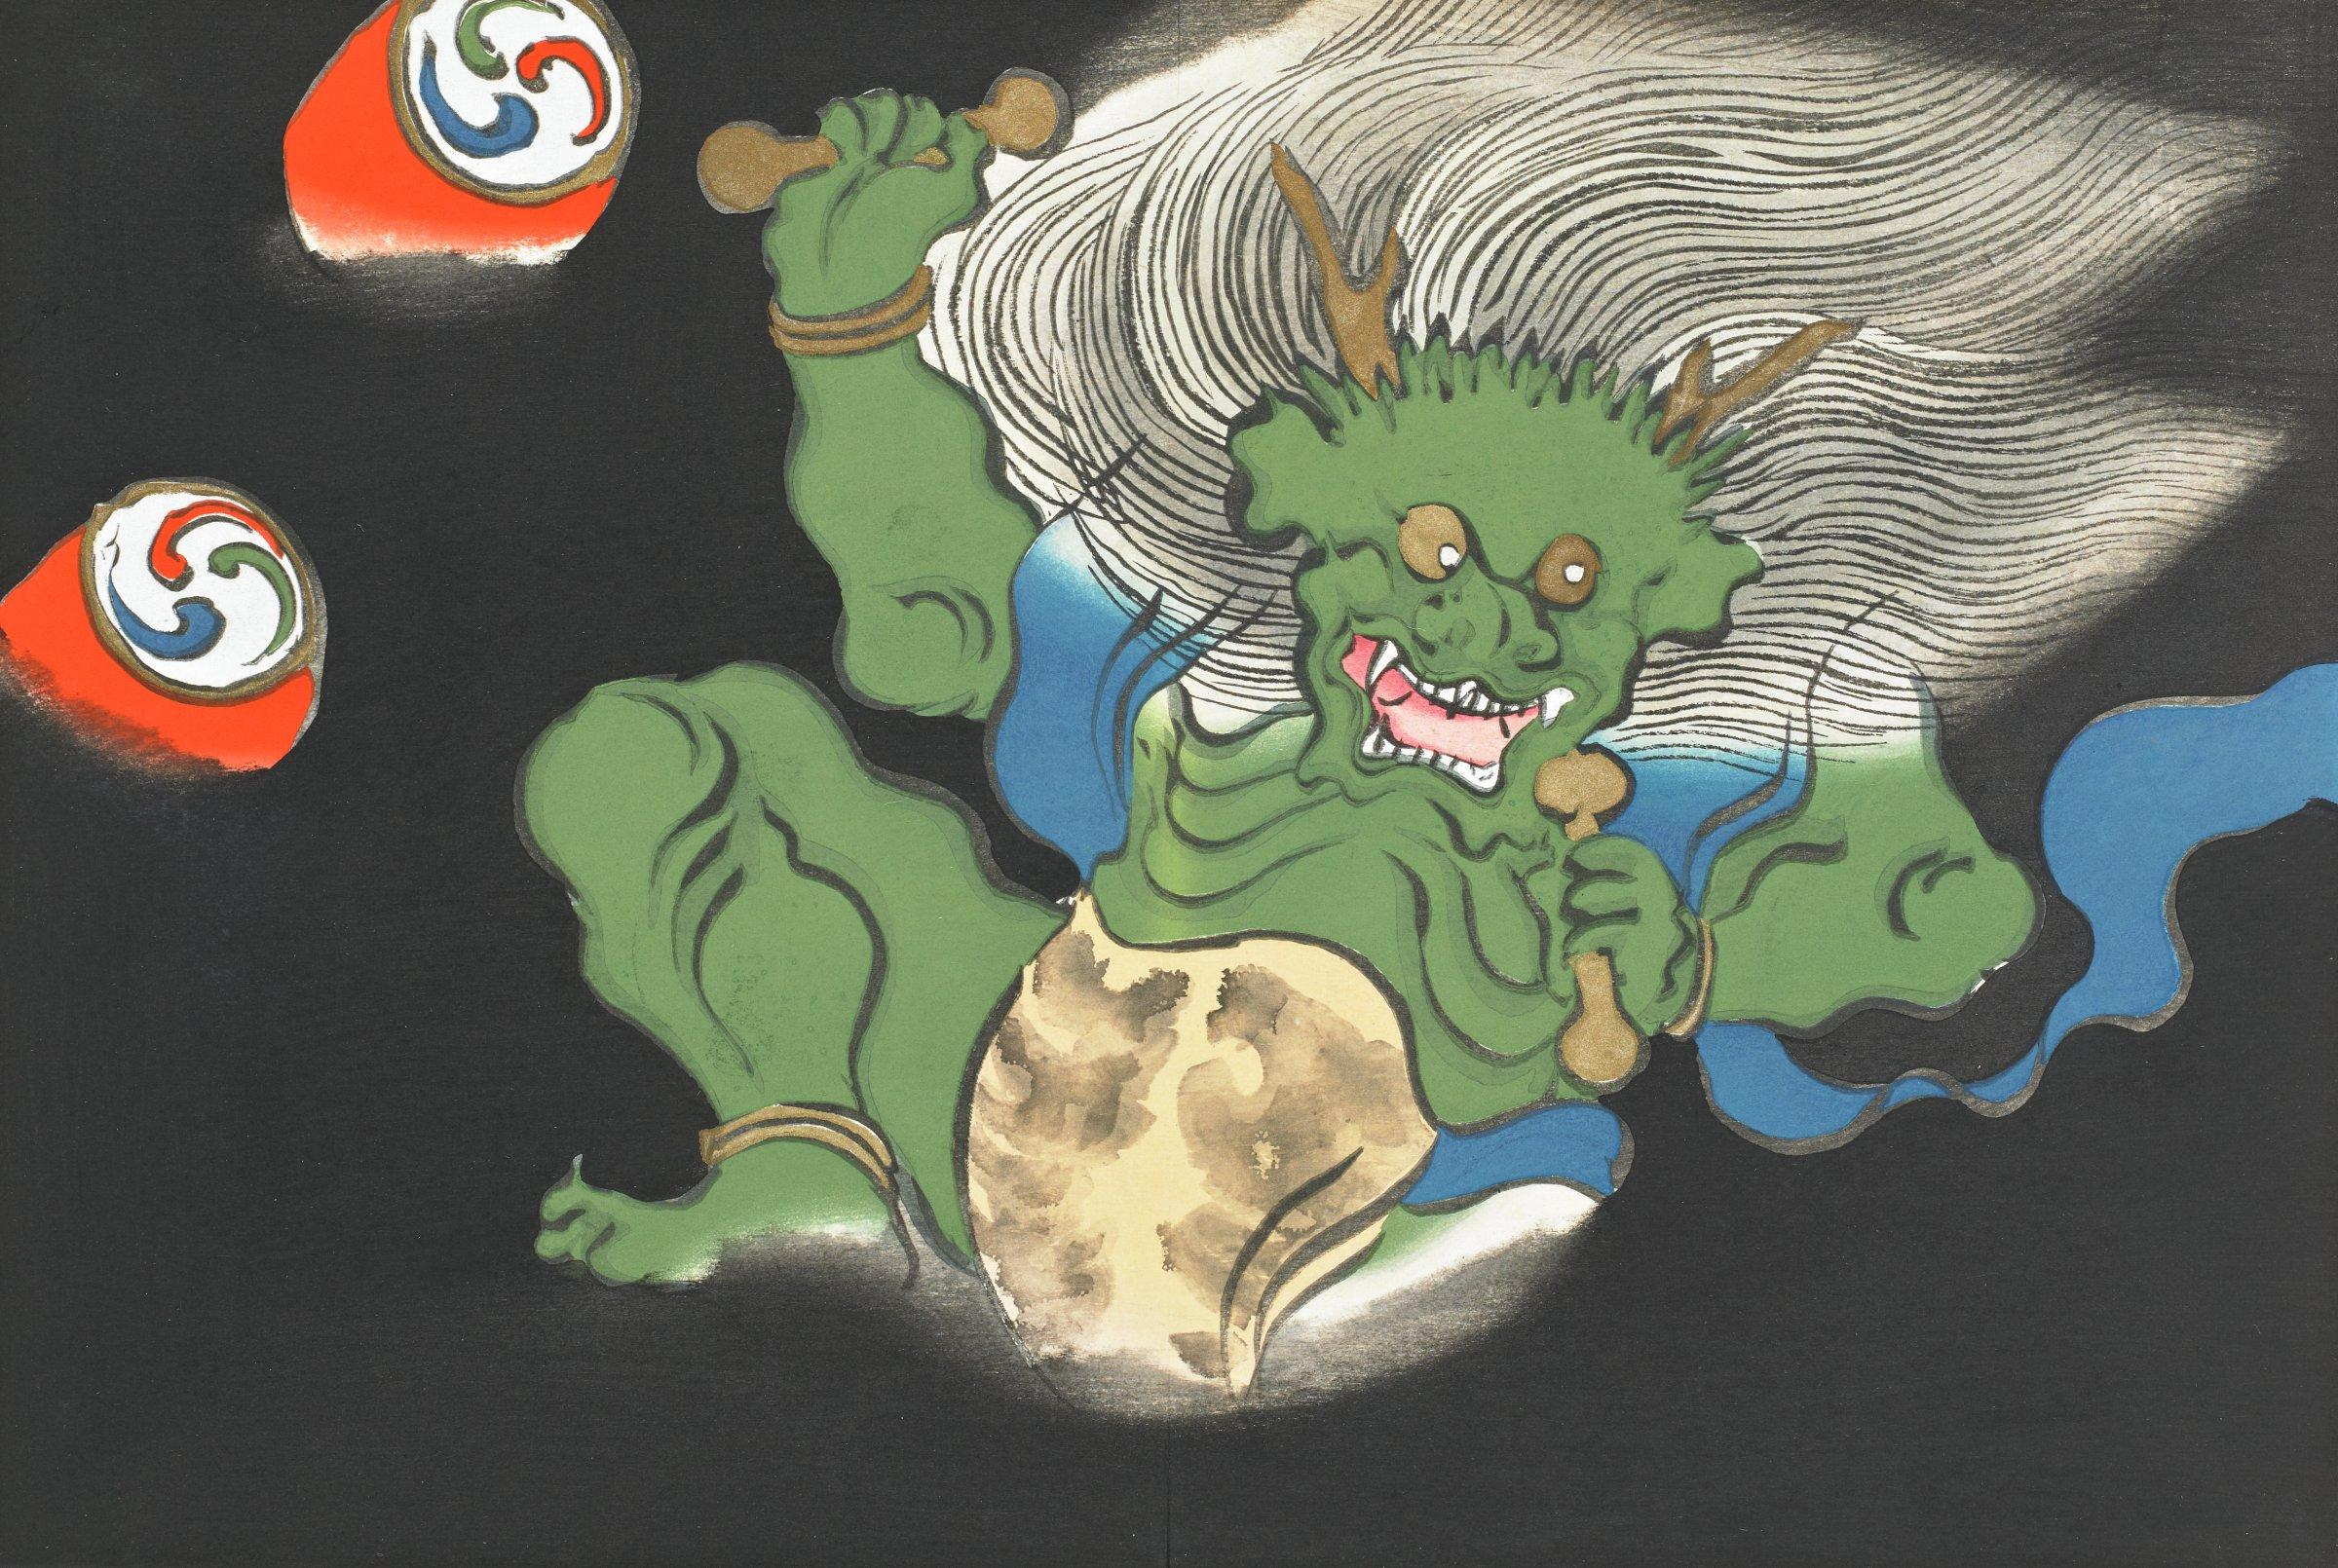 Kaminari (The God of Thunder and Lightning), from Momoyogusa (A World of Things), Volume 2, Kamisaka Sekka, ink and color on paper